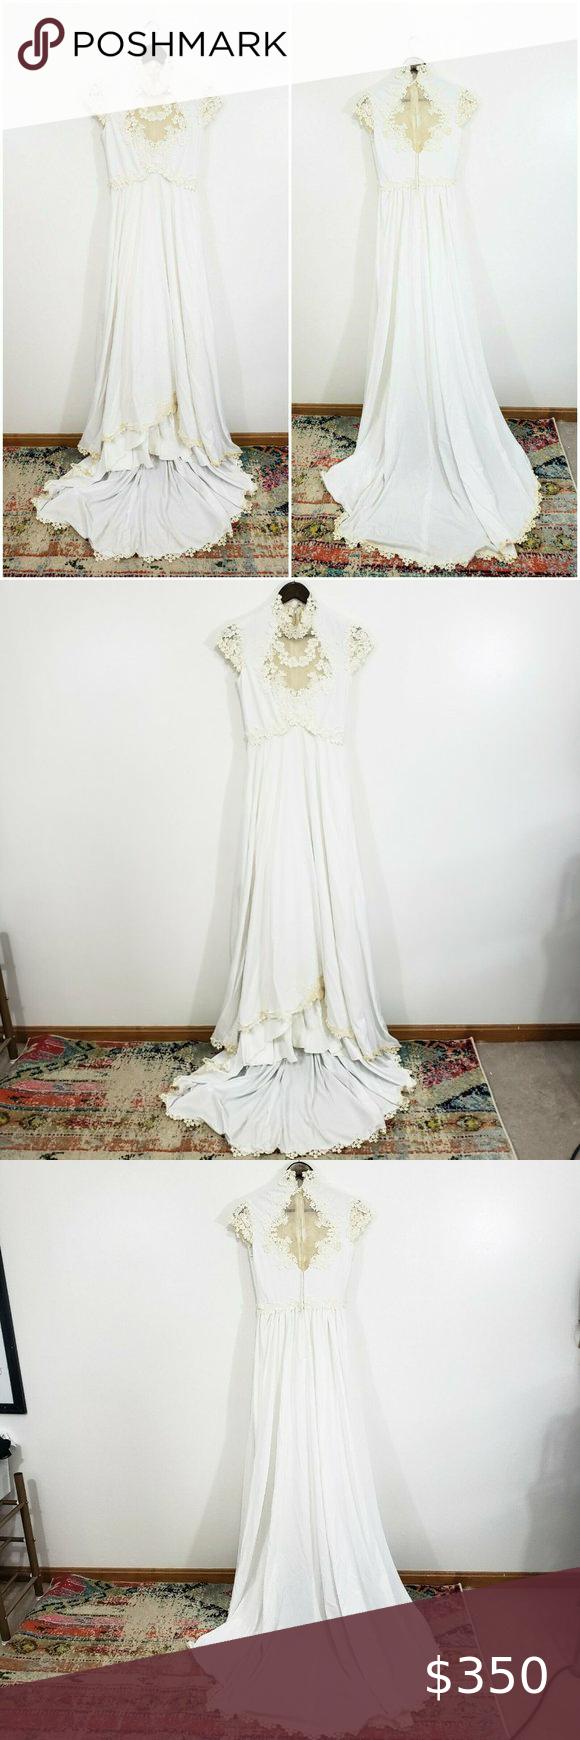 True Vintage 1970s Empire Waist Lace Wedding Dress In 2020 Wedding Dresses Lace Dresses Wedding Dresses